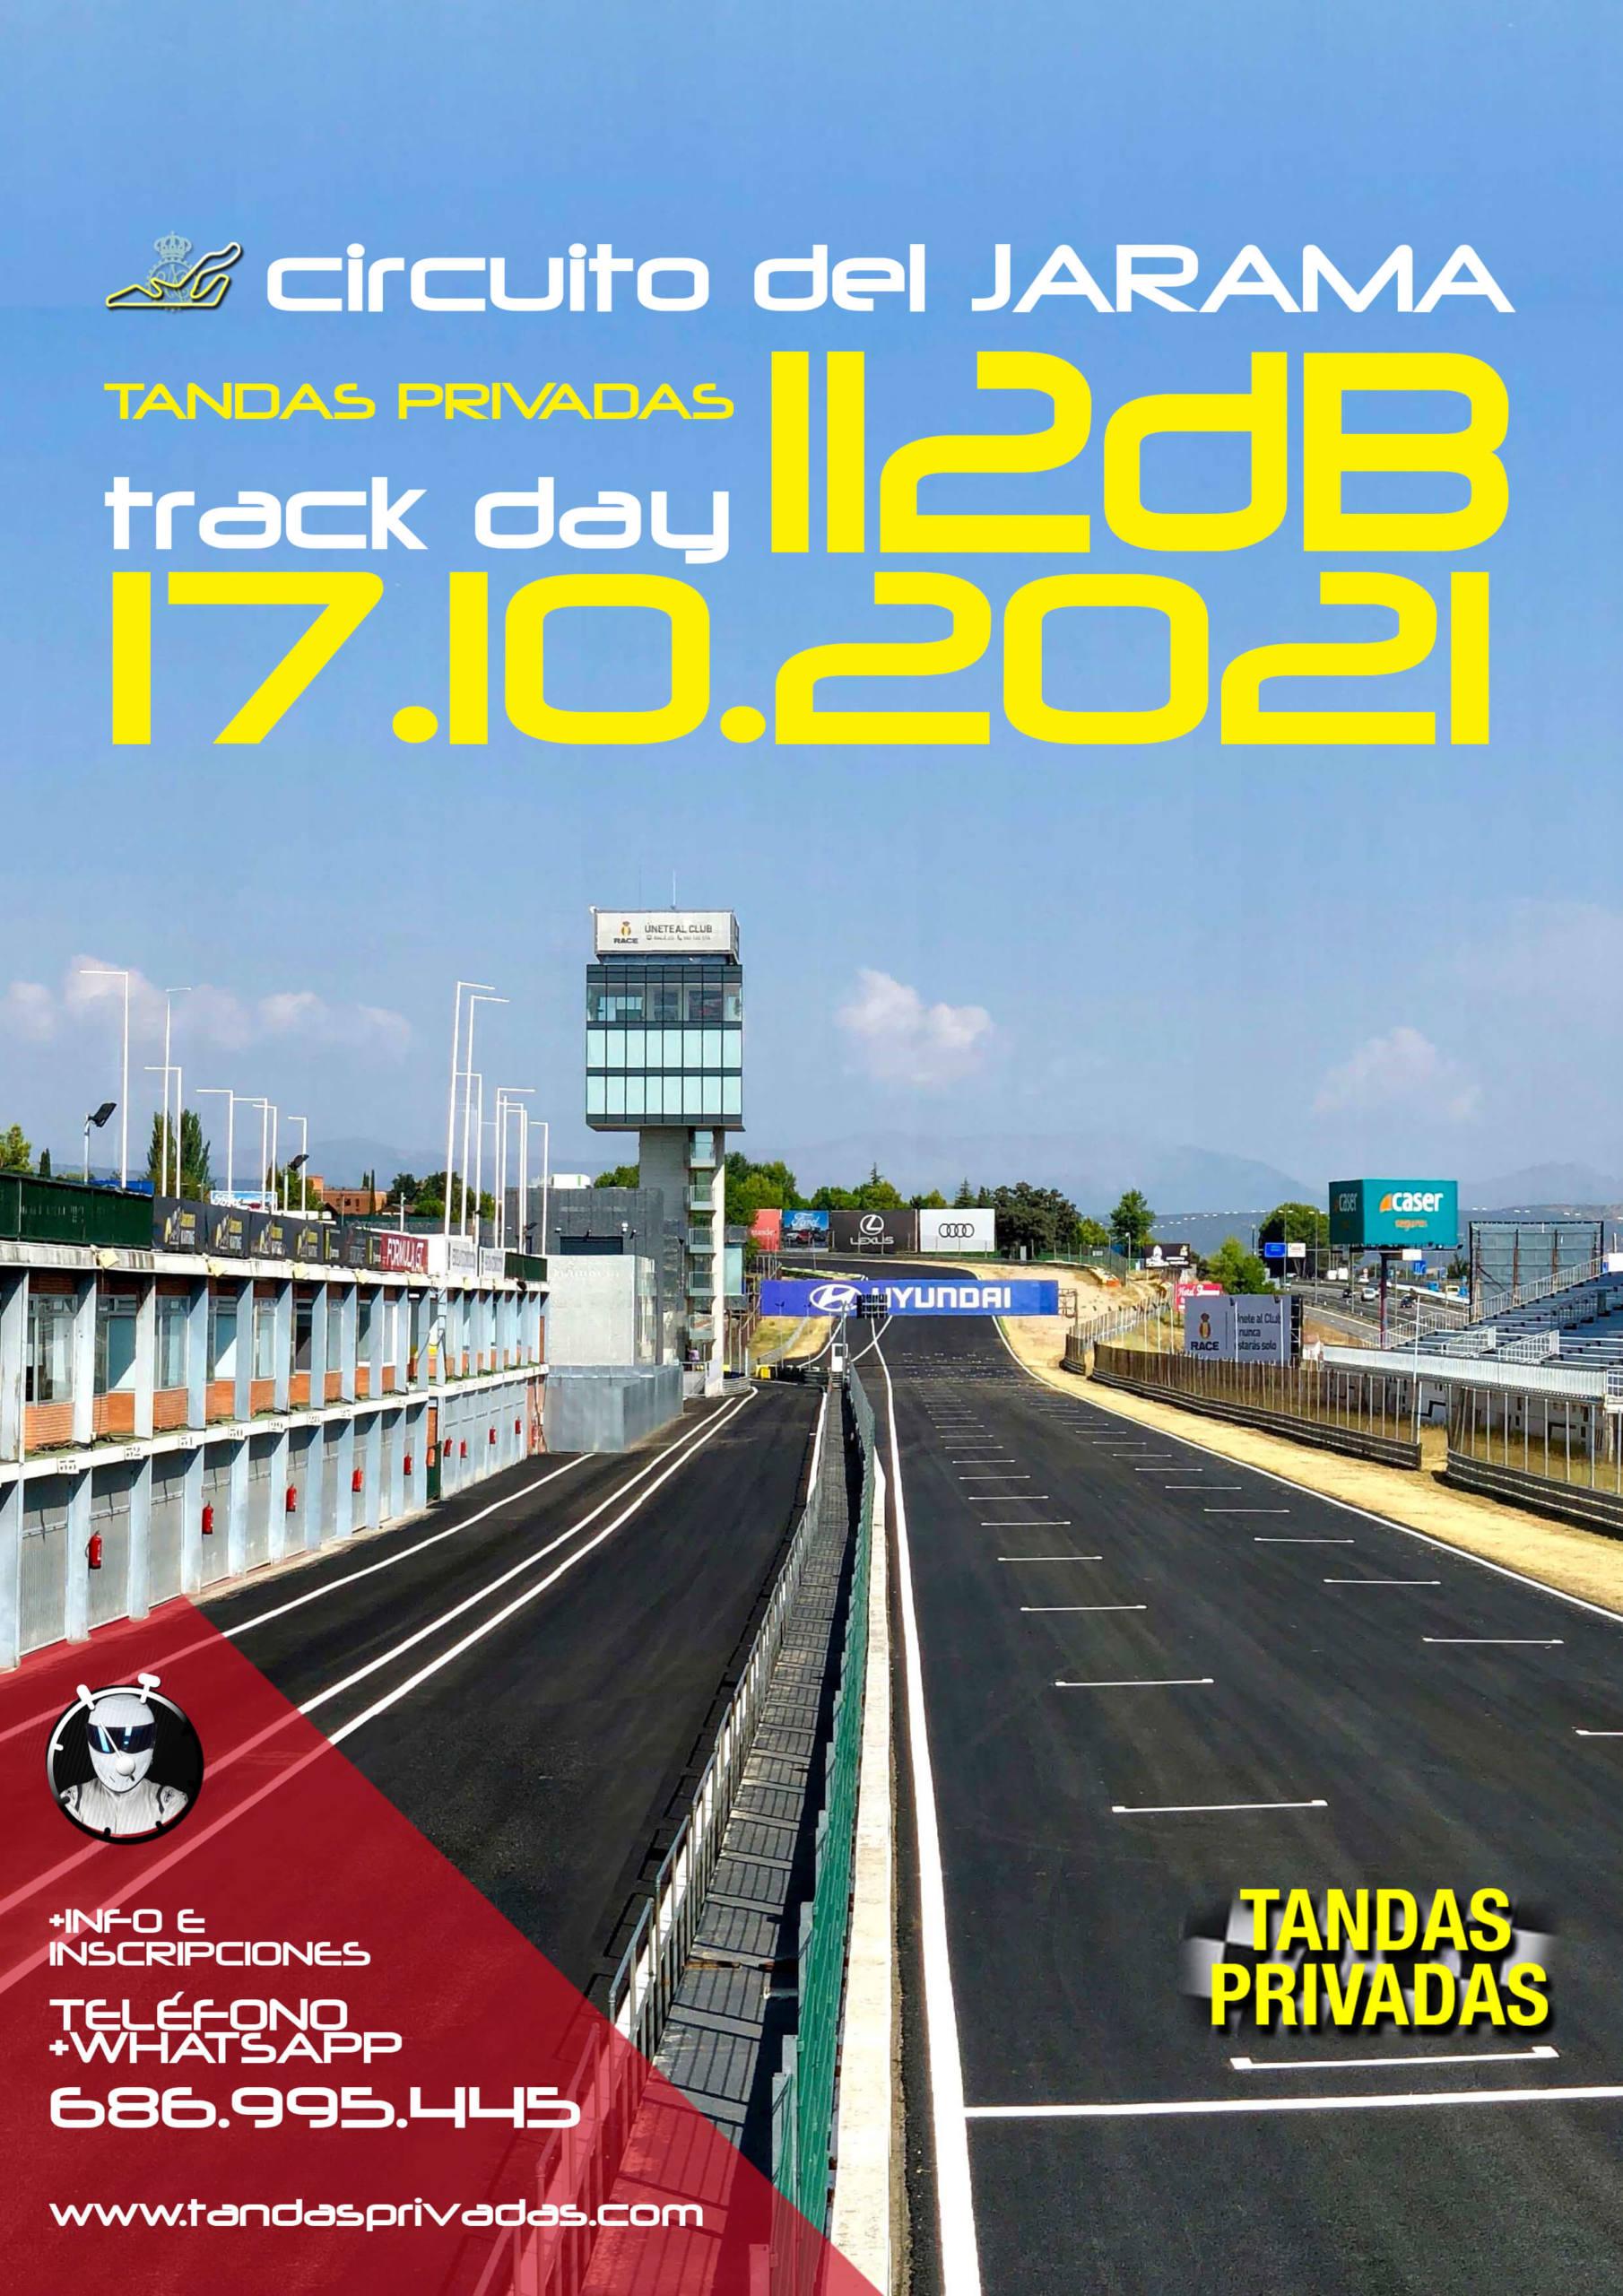 Tandas coches 112dB en Madrid, por Tandas Privadas